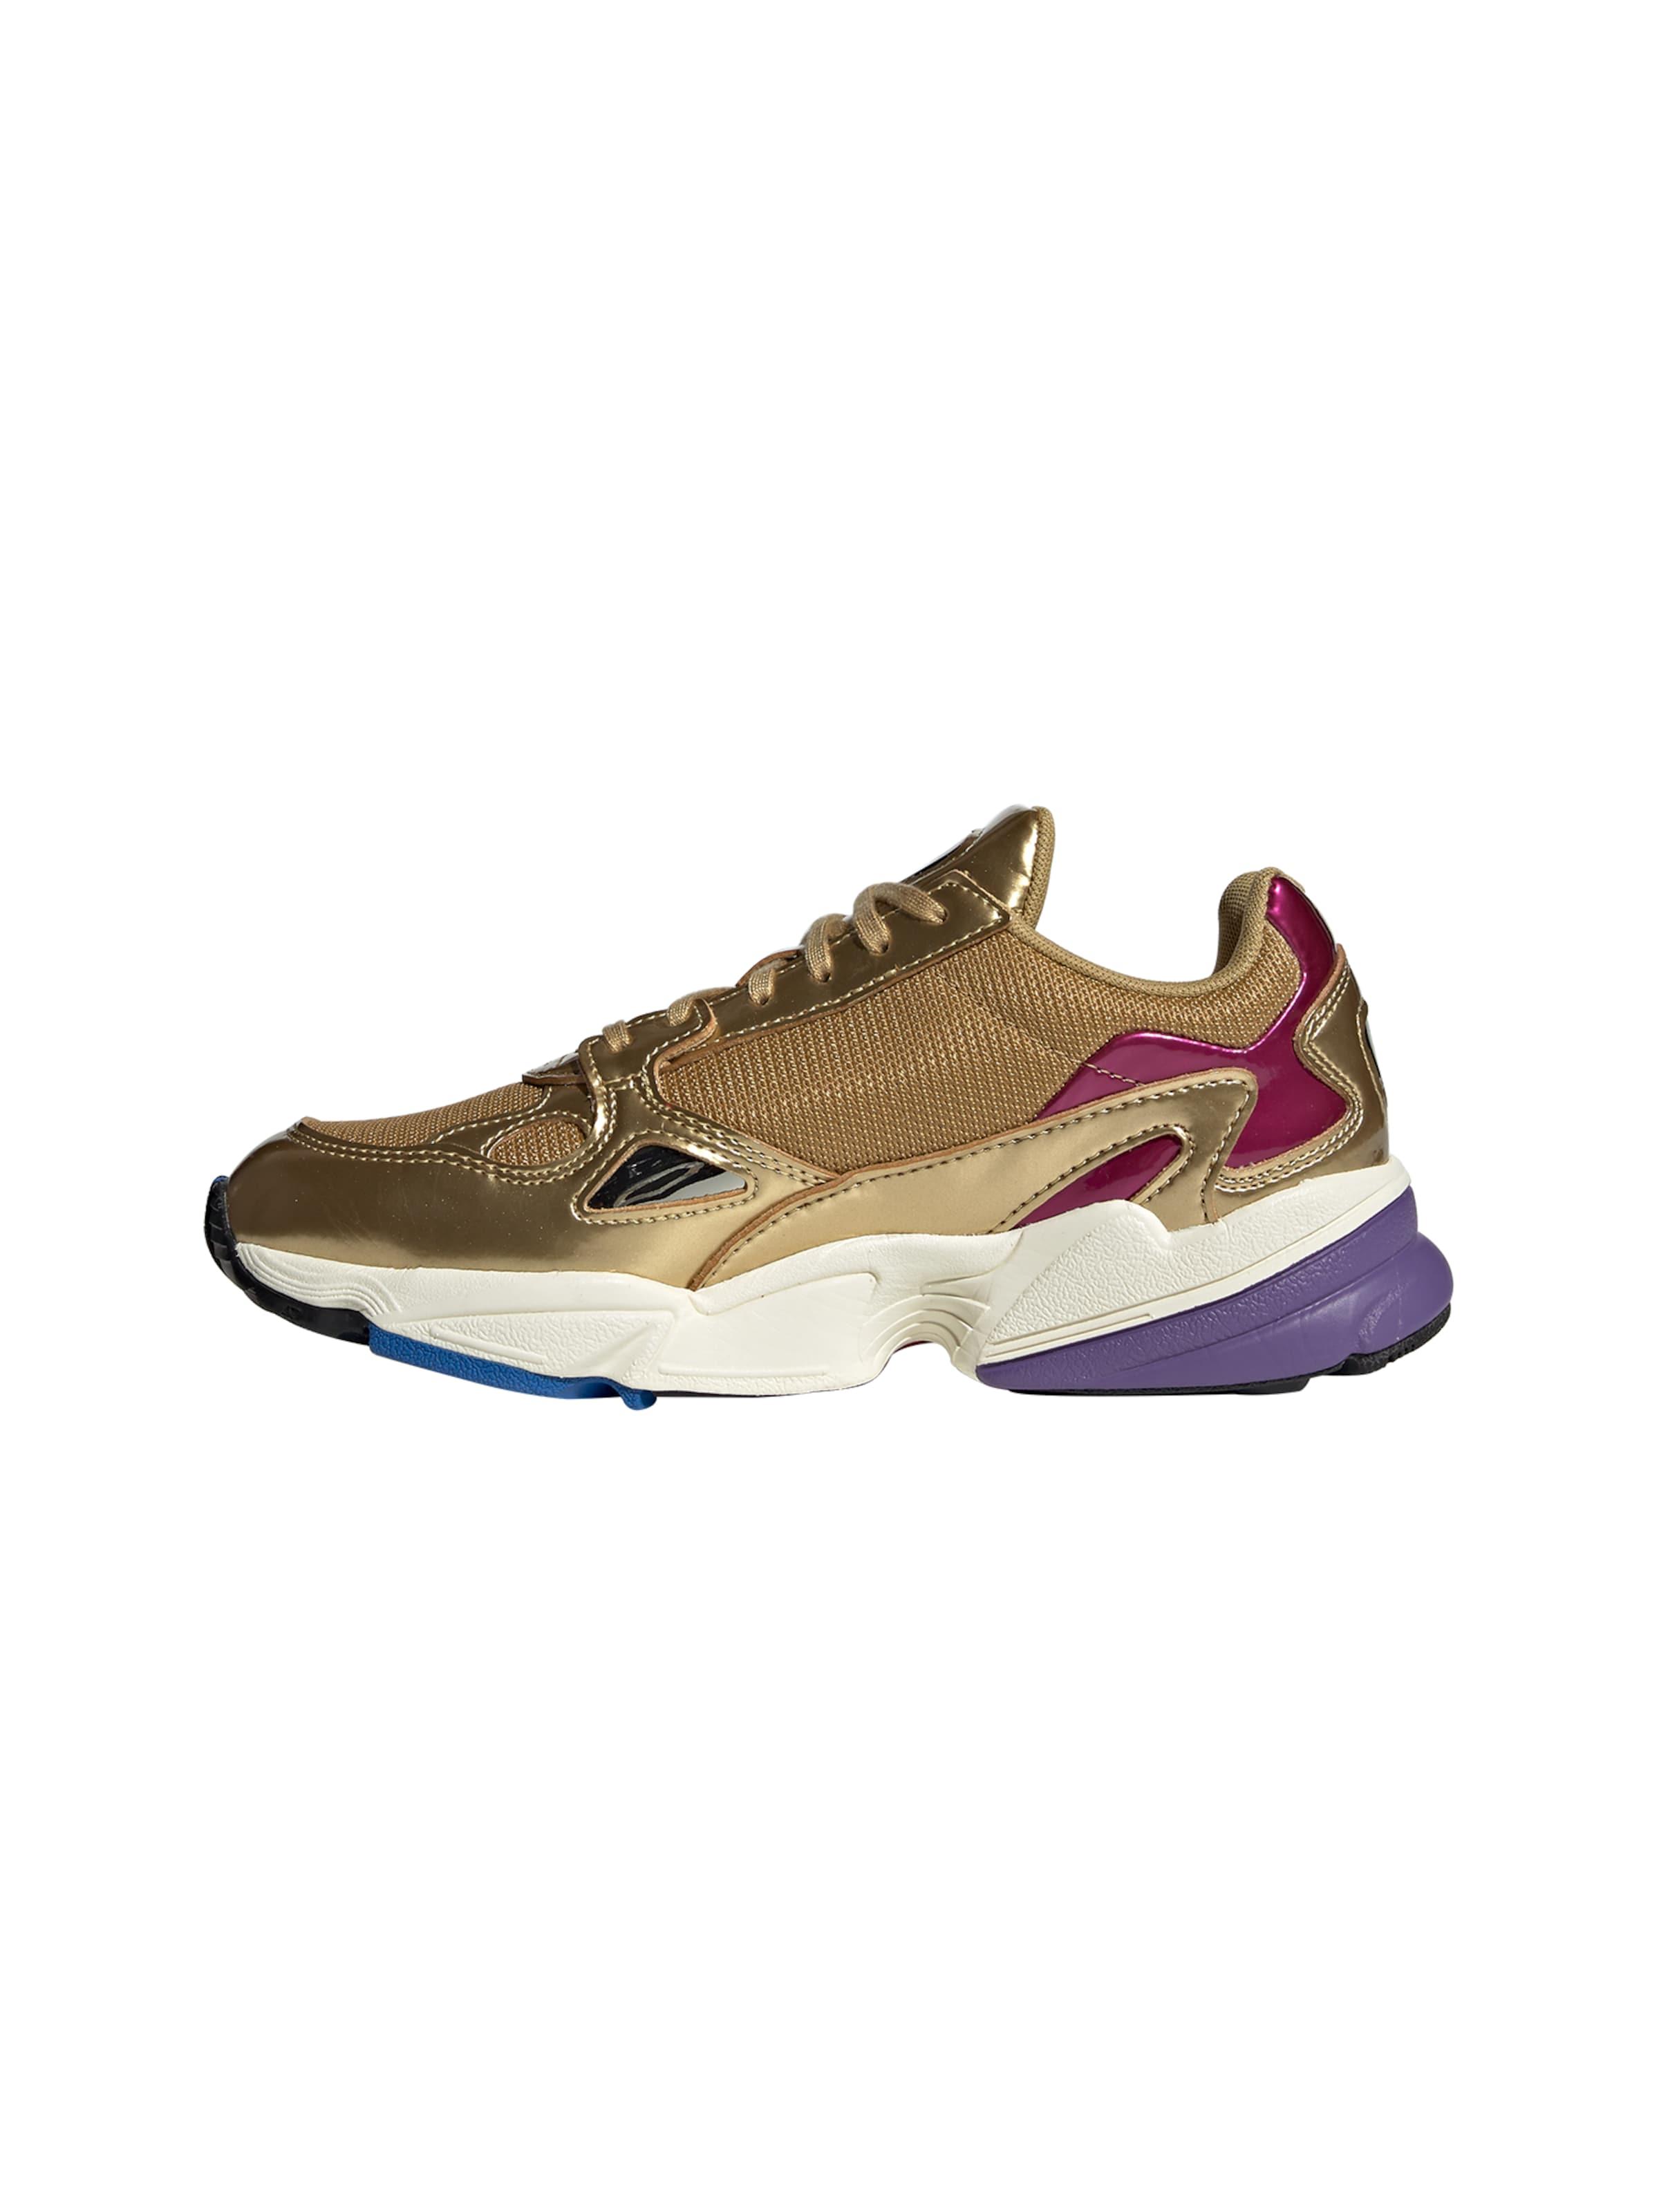 Sneaker GoldWeiß 'falcon' Originals In Adidas lK1c3FTJ